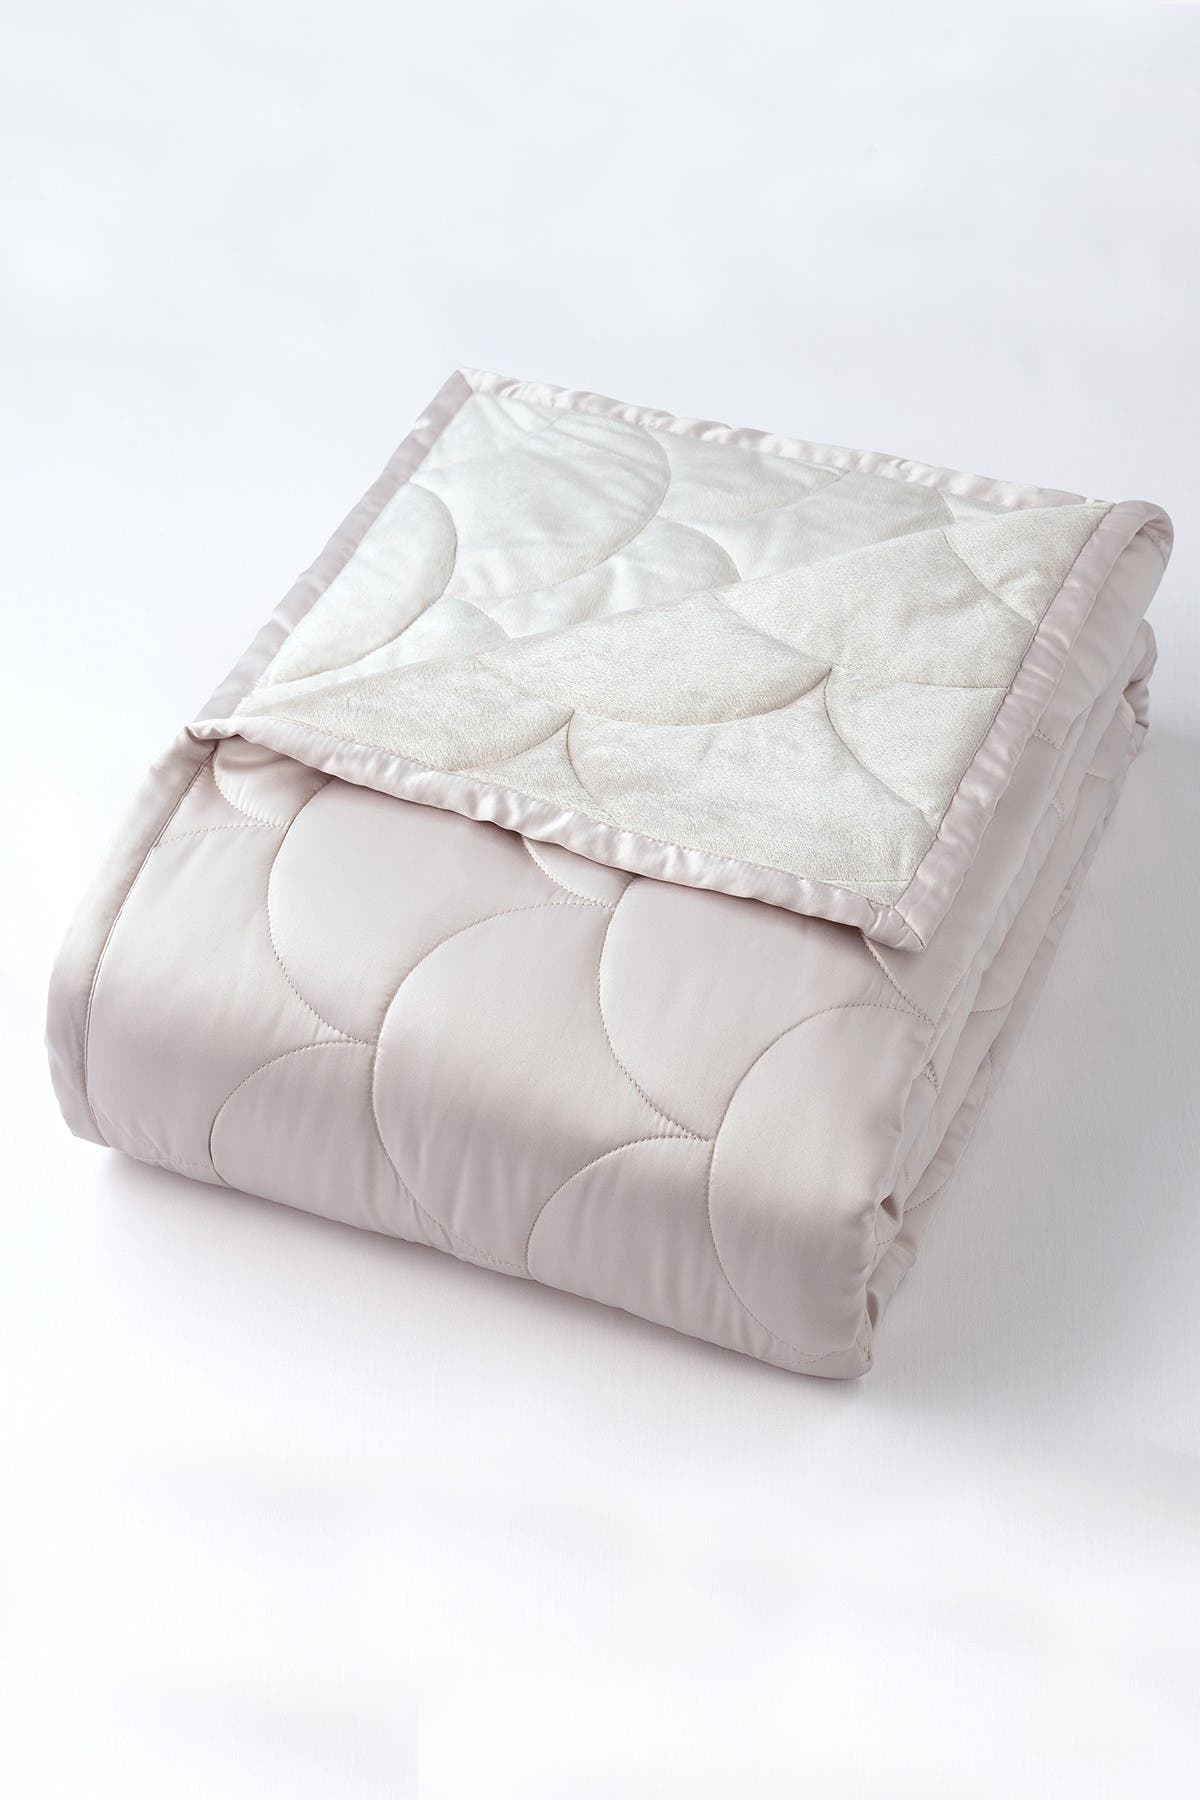 Image of CLIMAREST Nikki Chu Twin Velvet/Satin Reversible Blanket - Silver